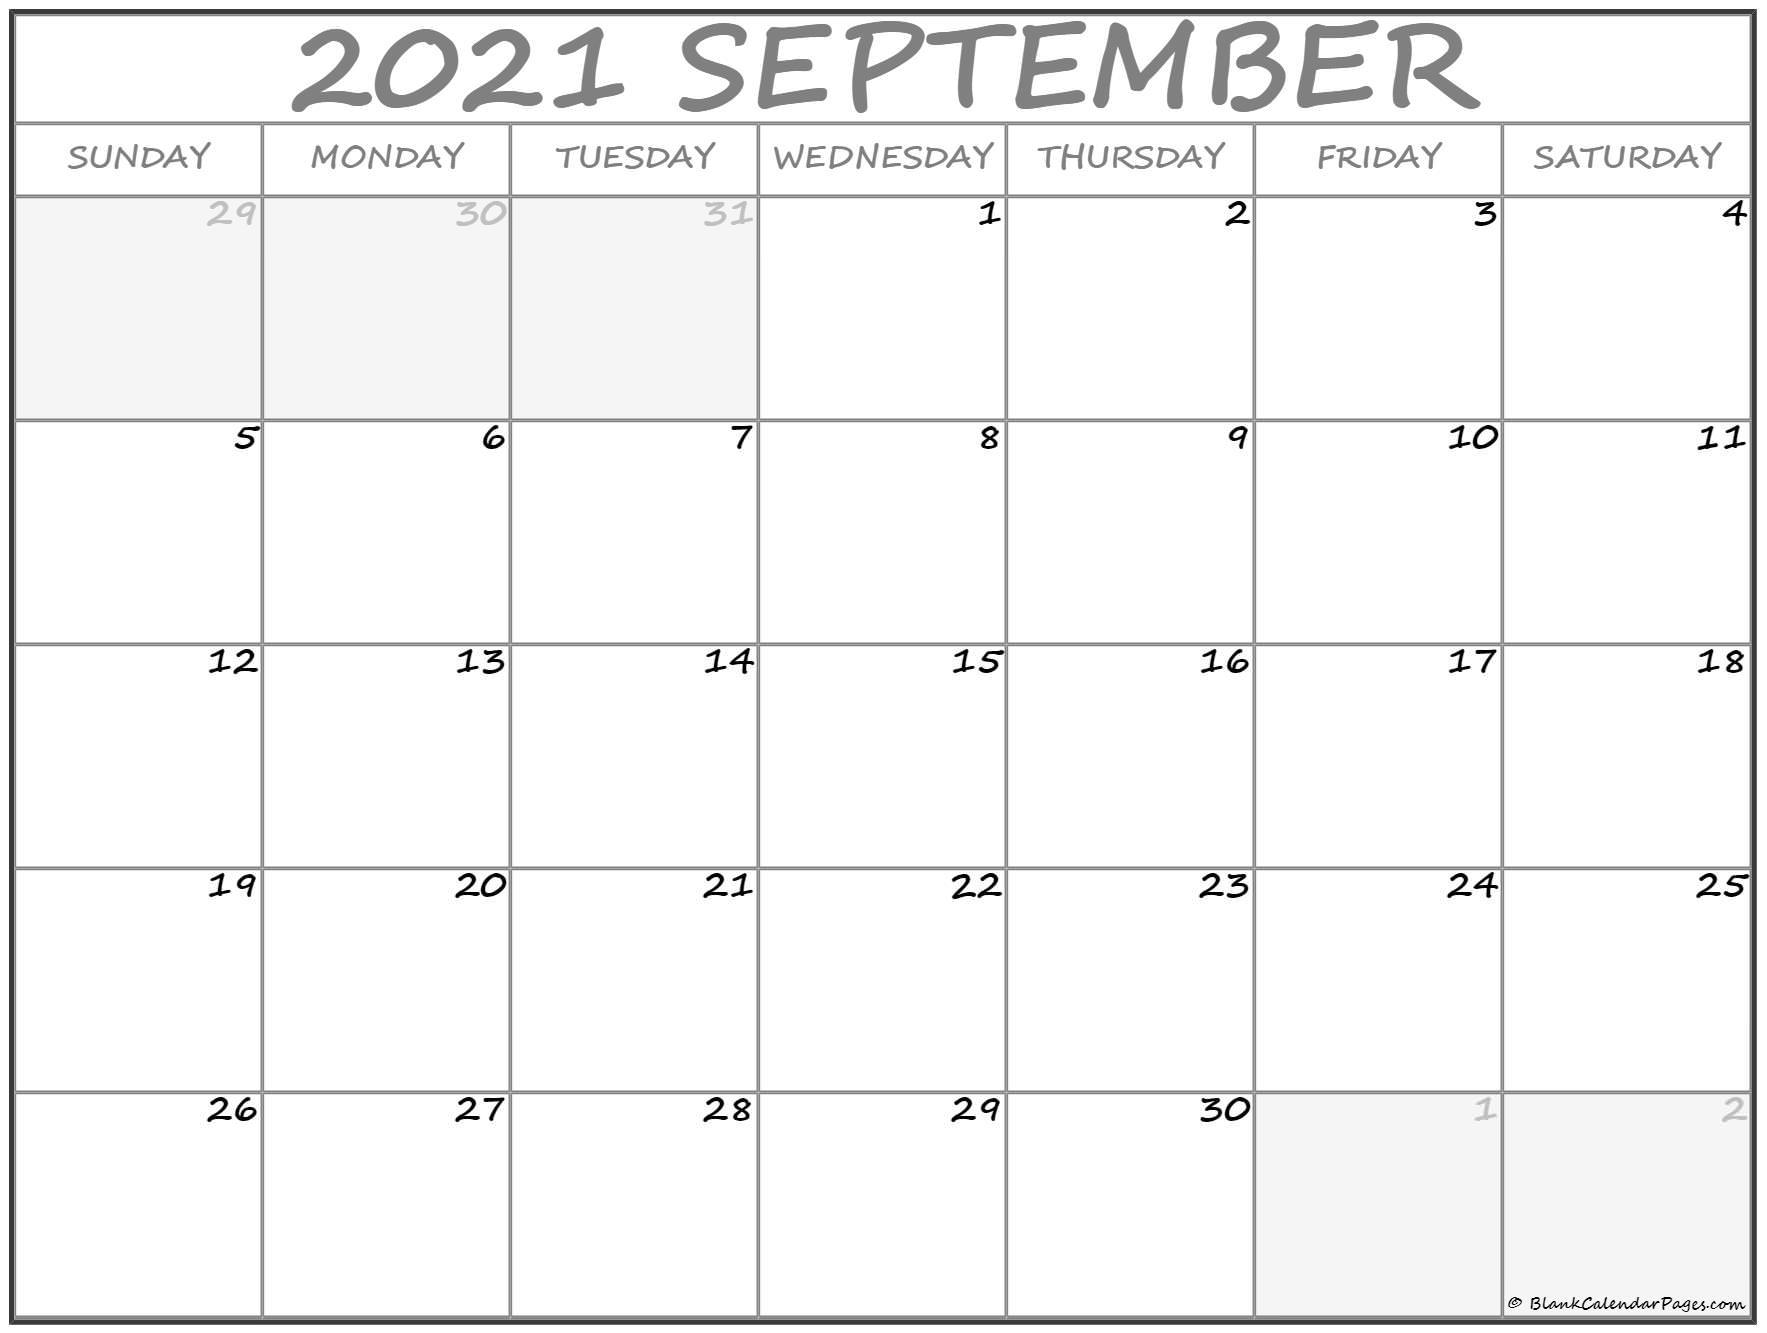 September 2021 Calendar | Free Printable Calendar Templates